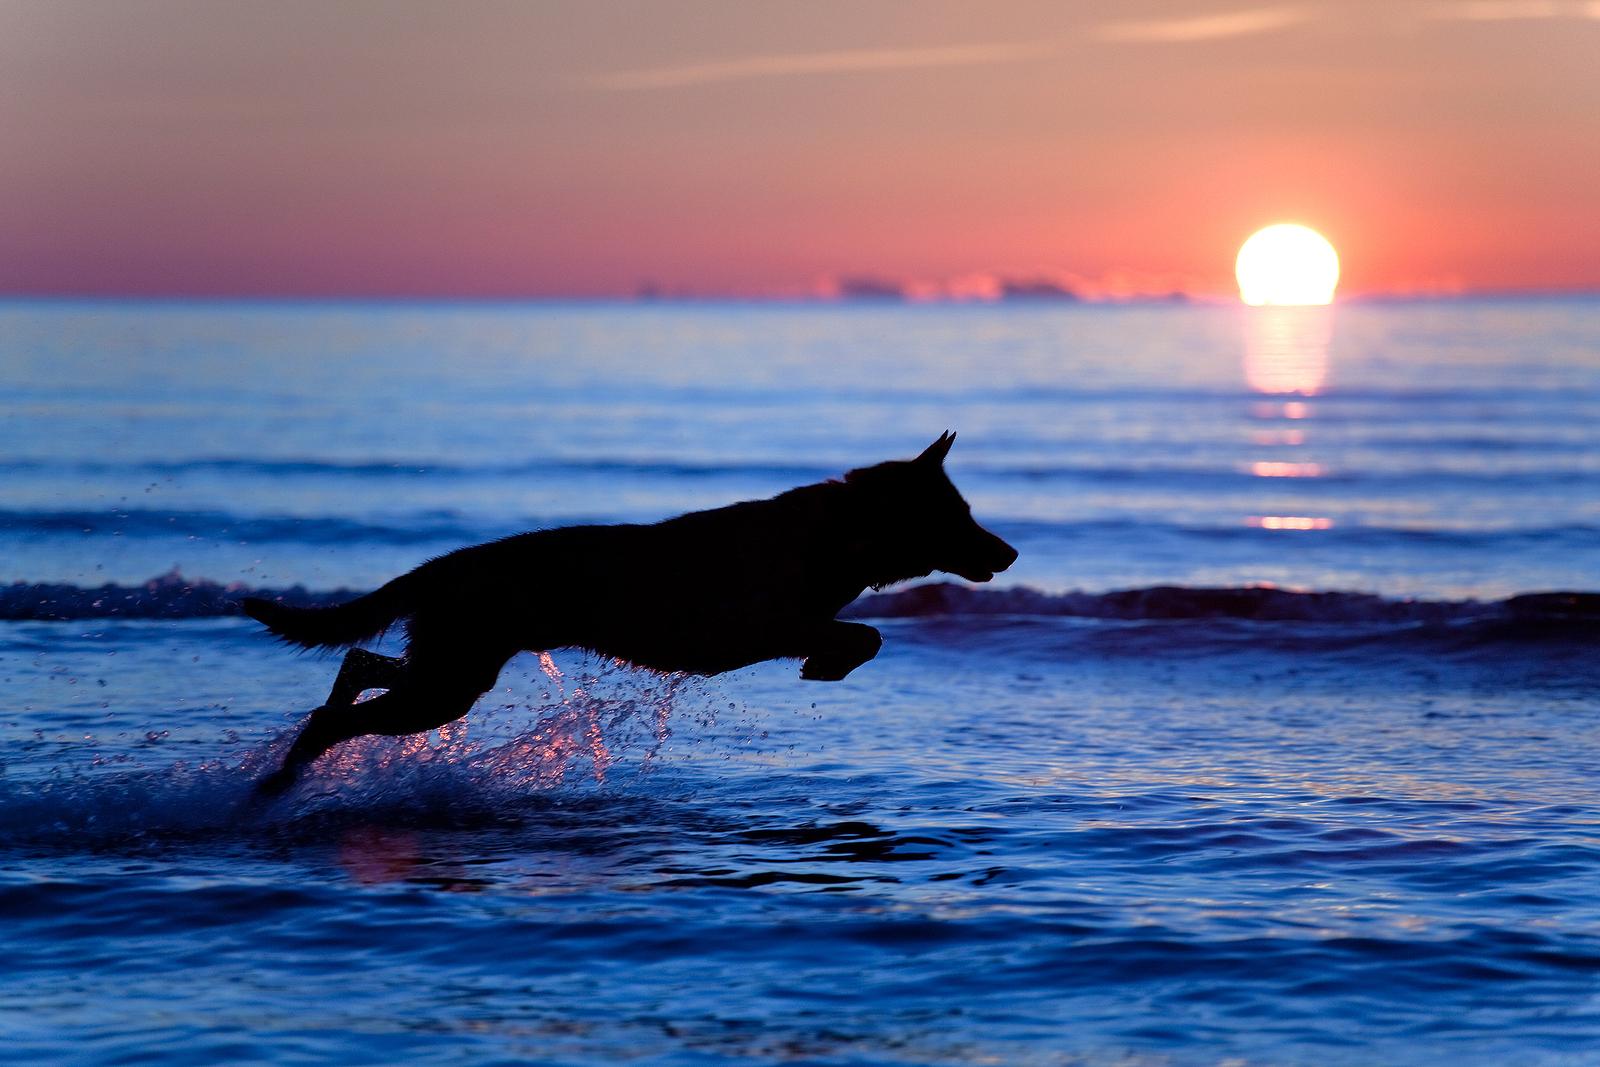 bigstock-Silhouette-Of-A-Dog-Running-On-10843775.jpg